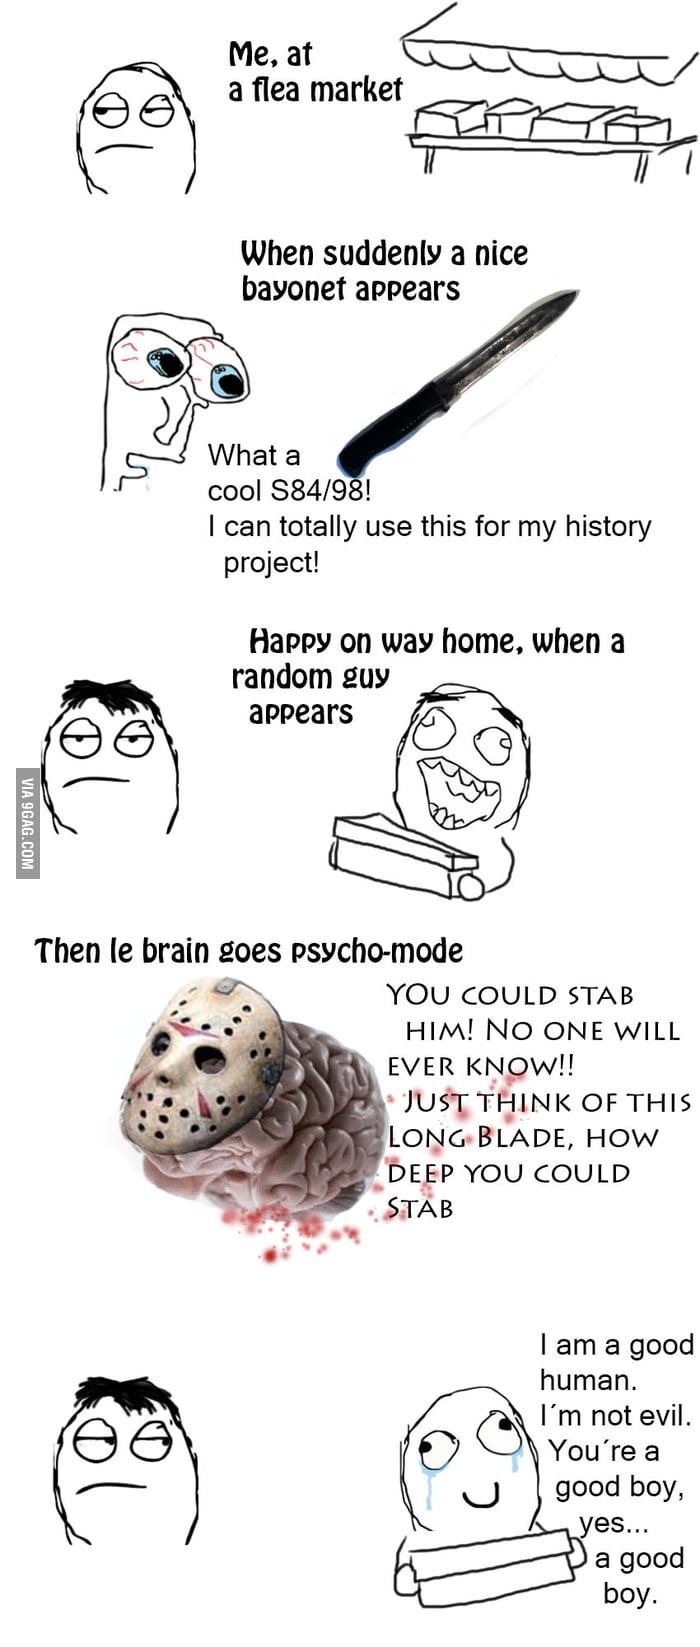 Scumbag Brain goes psycho